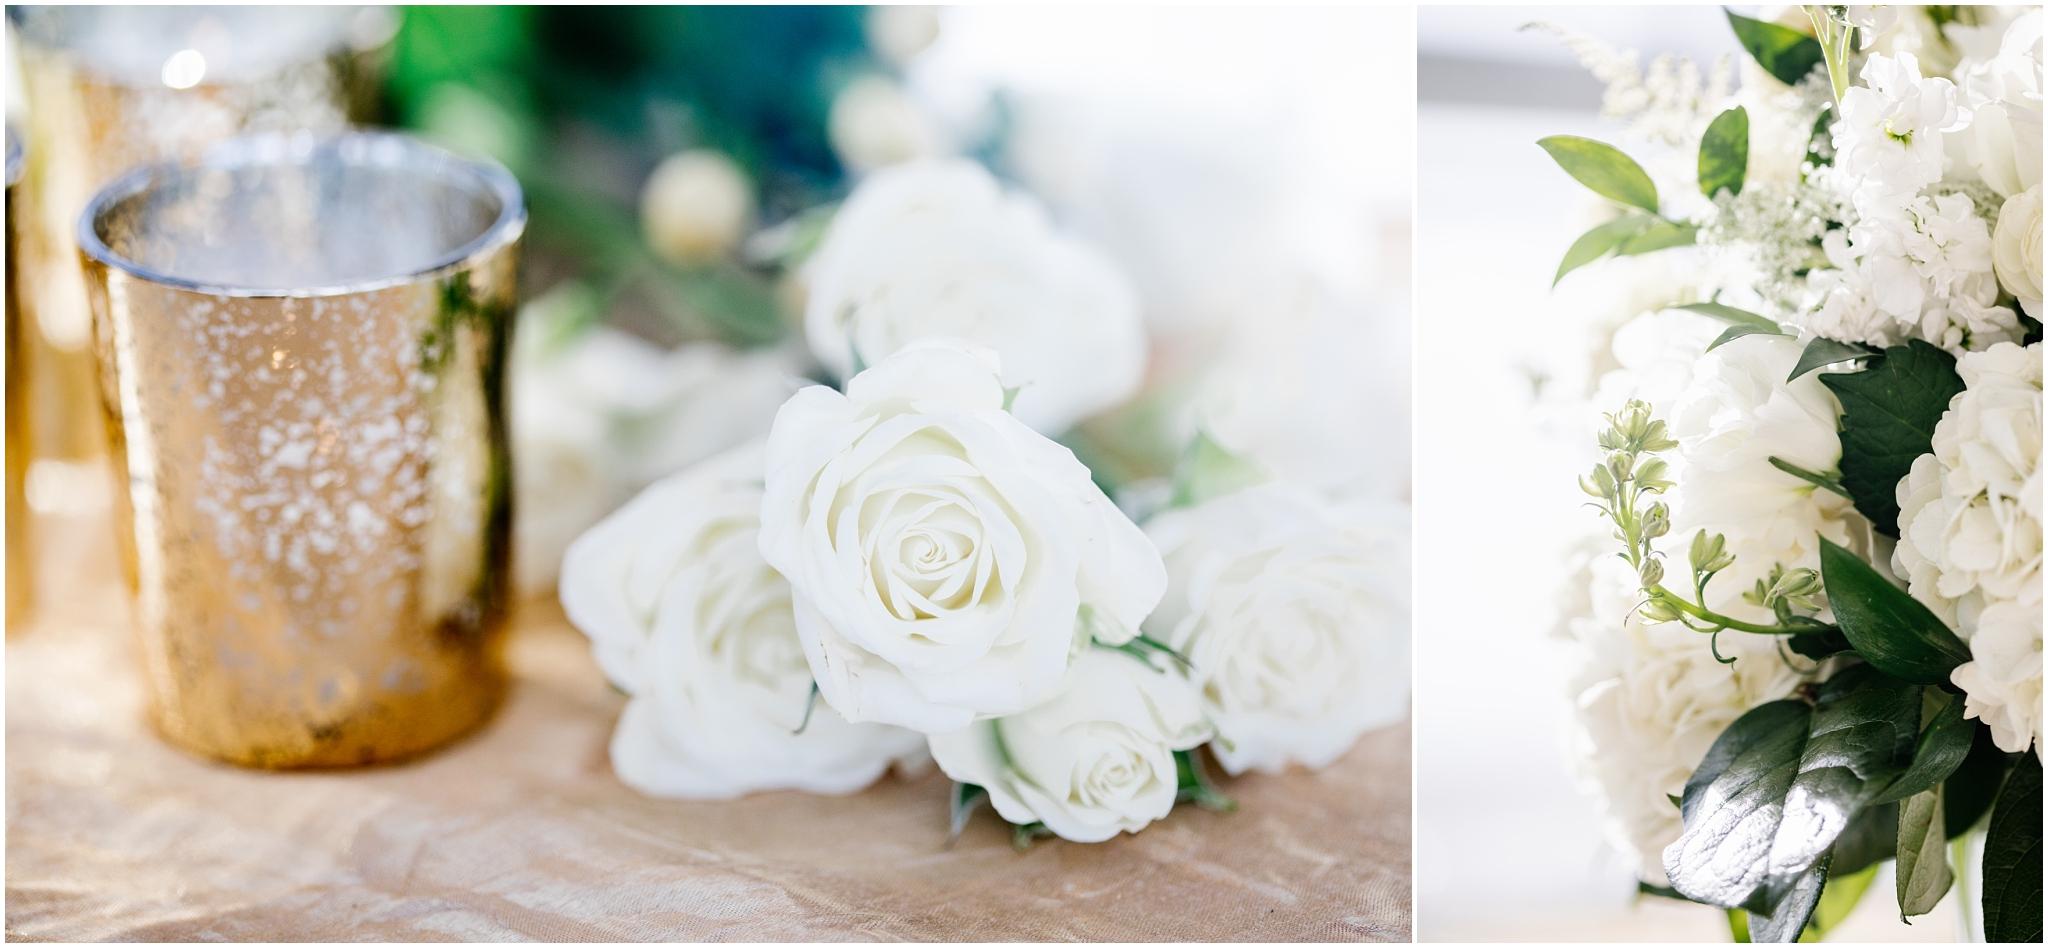 CherylandTyler-333_Lizzie-B-Imagery-Utah-Wedding-Photographer-Salt-Lake-City-Temple-Wells-Fargo-Building-Reception.jpg